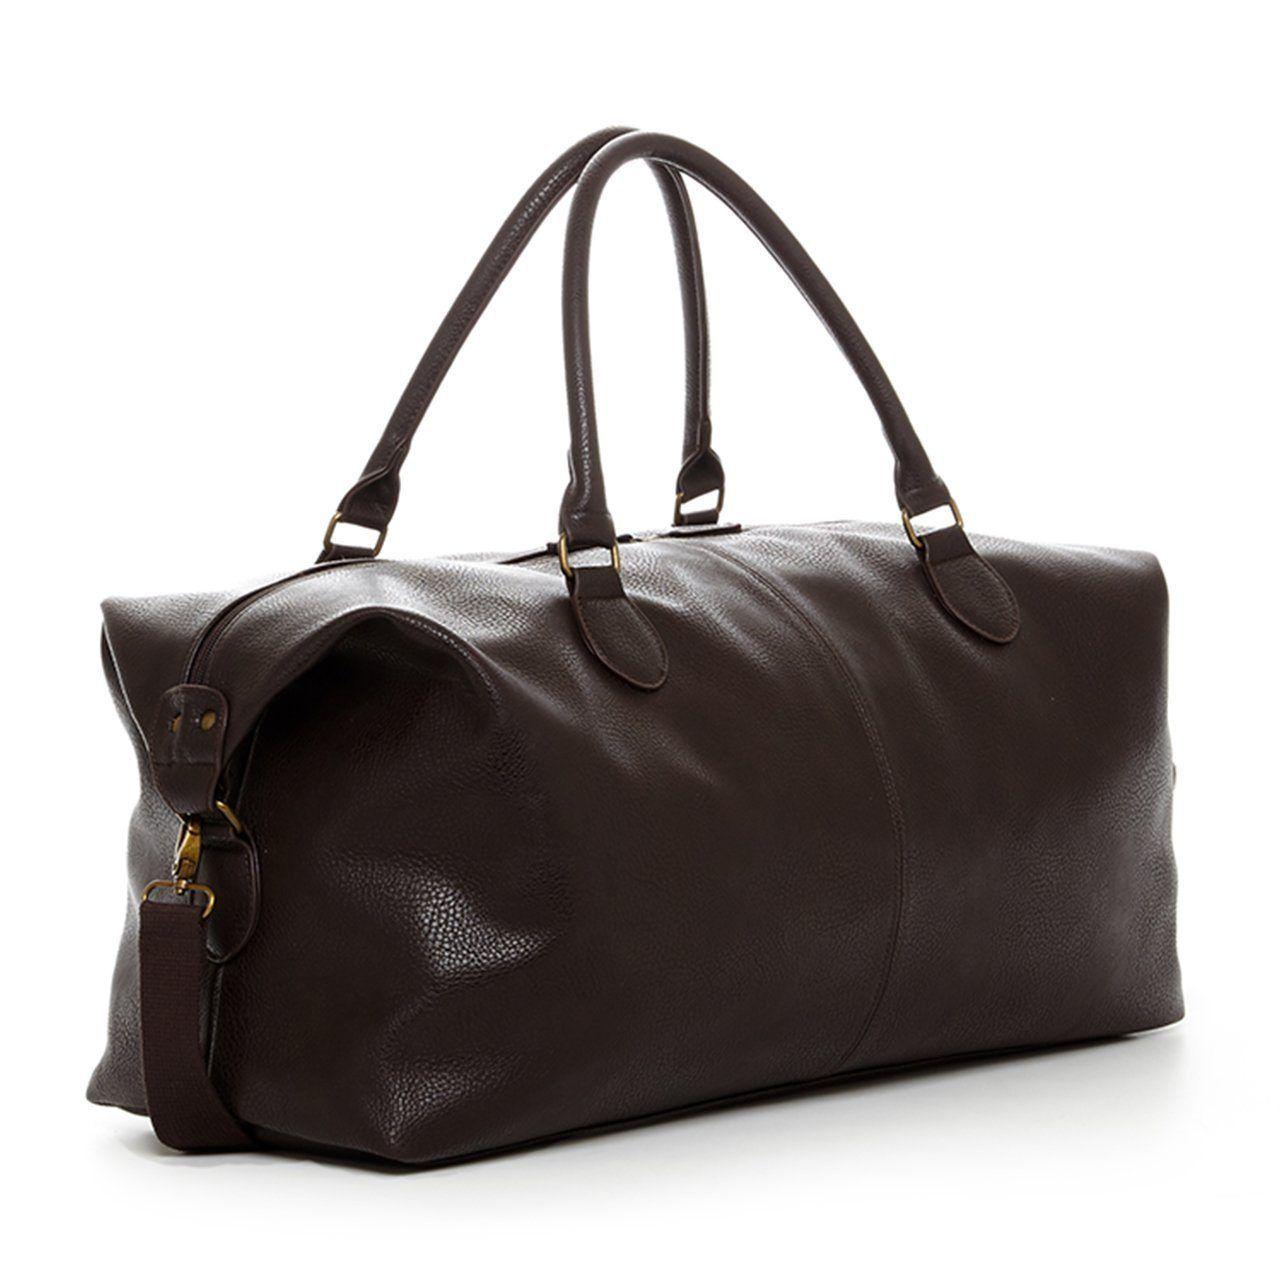 Gunner Vegan Leather Duffle Bag Leather Duffle Bag Leather Duffel Leather Duffle